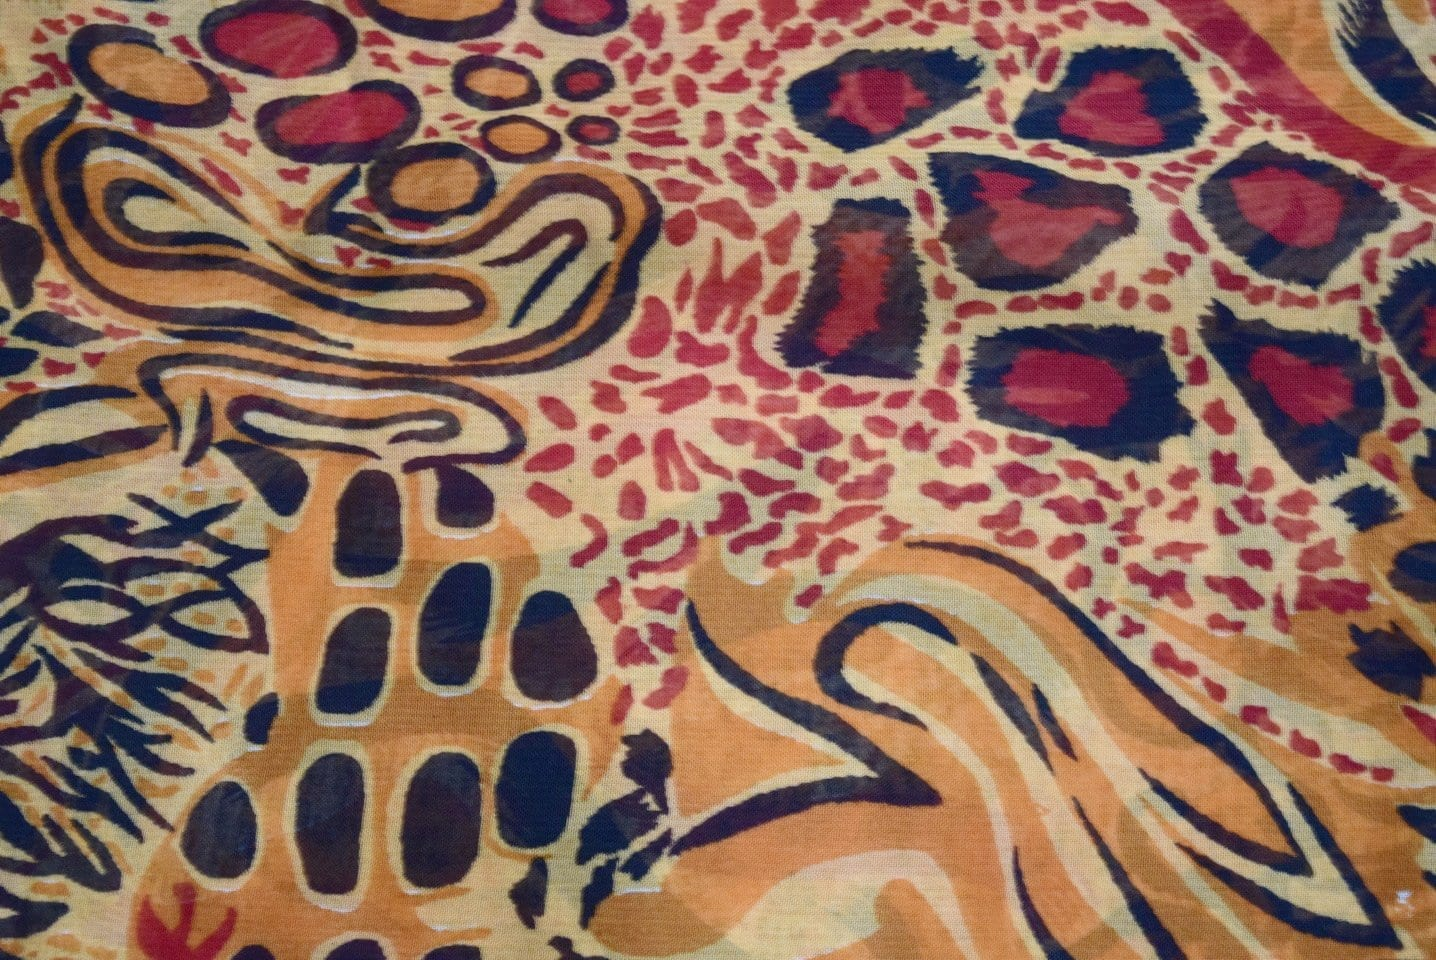 GEORGETTE PRINTED fabric for Kurti, Saree, Salwar, Dupatta GF034 3